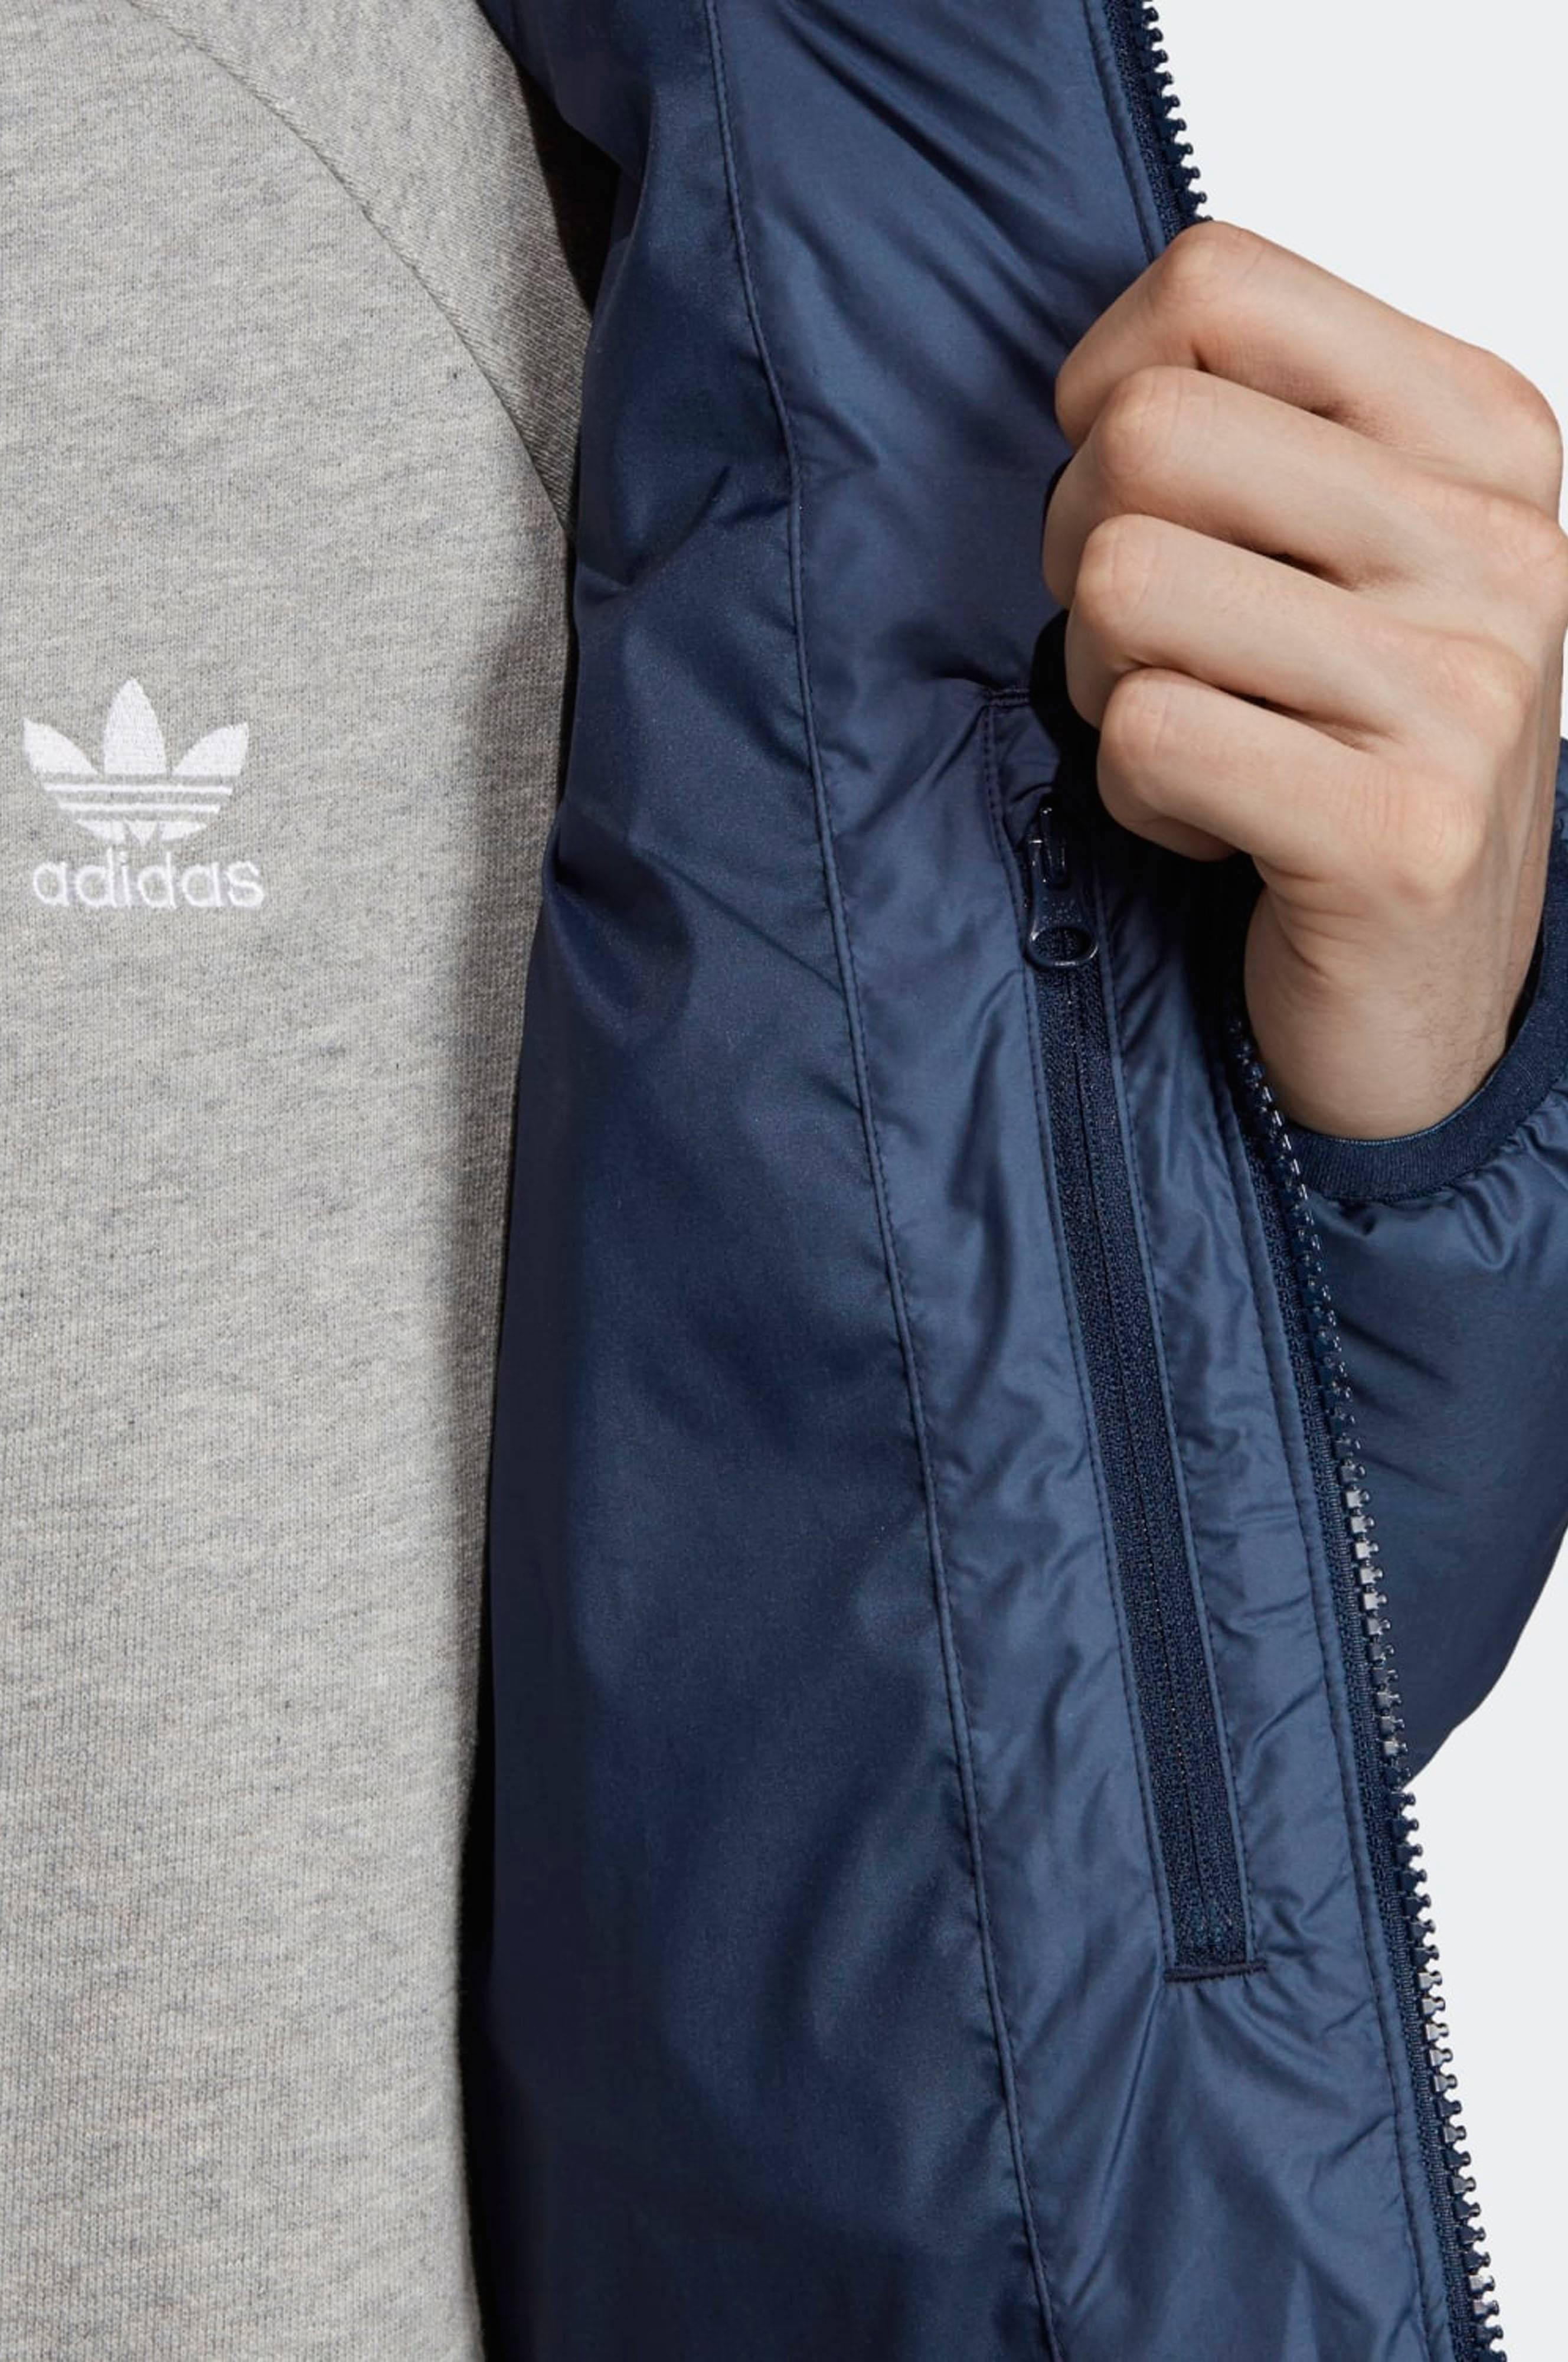 adidas Originals Jakke Padded Blå Dunjakker & vatterte